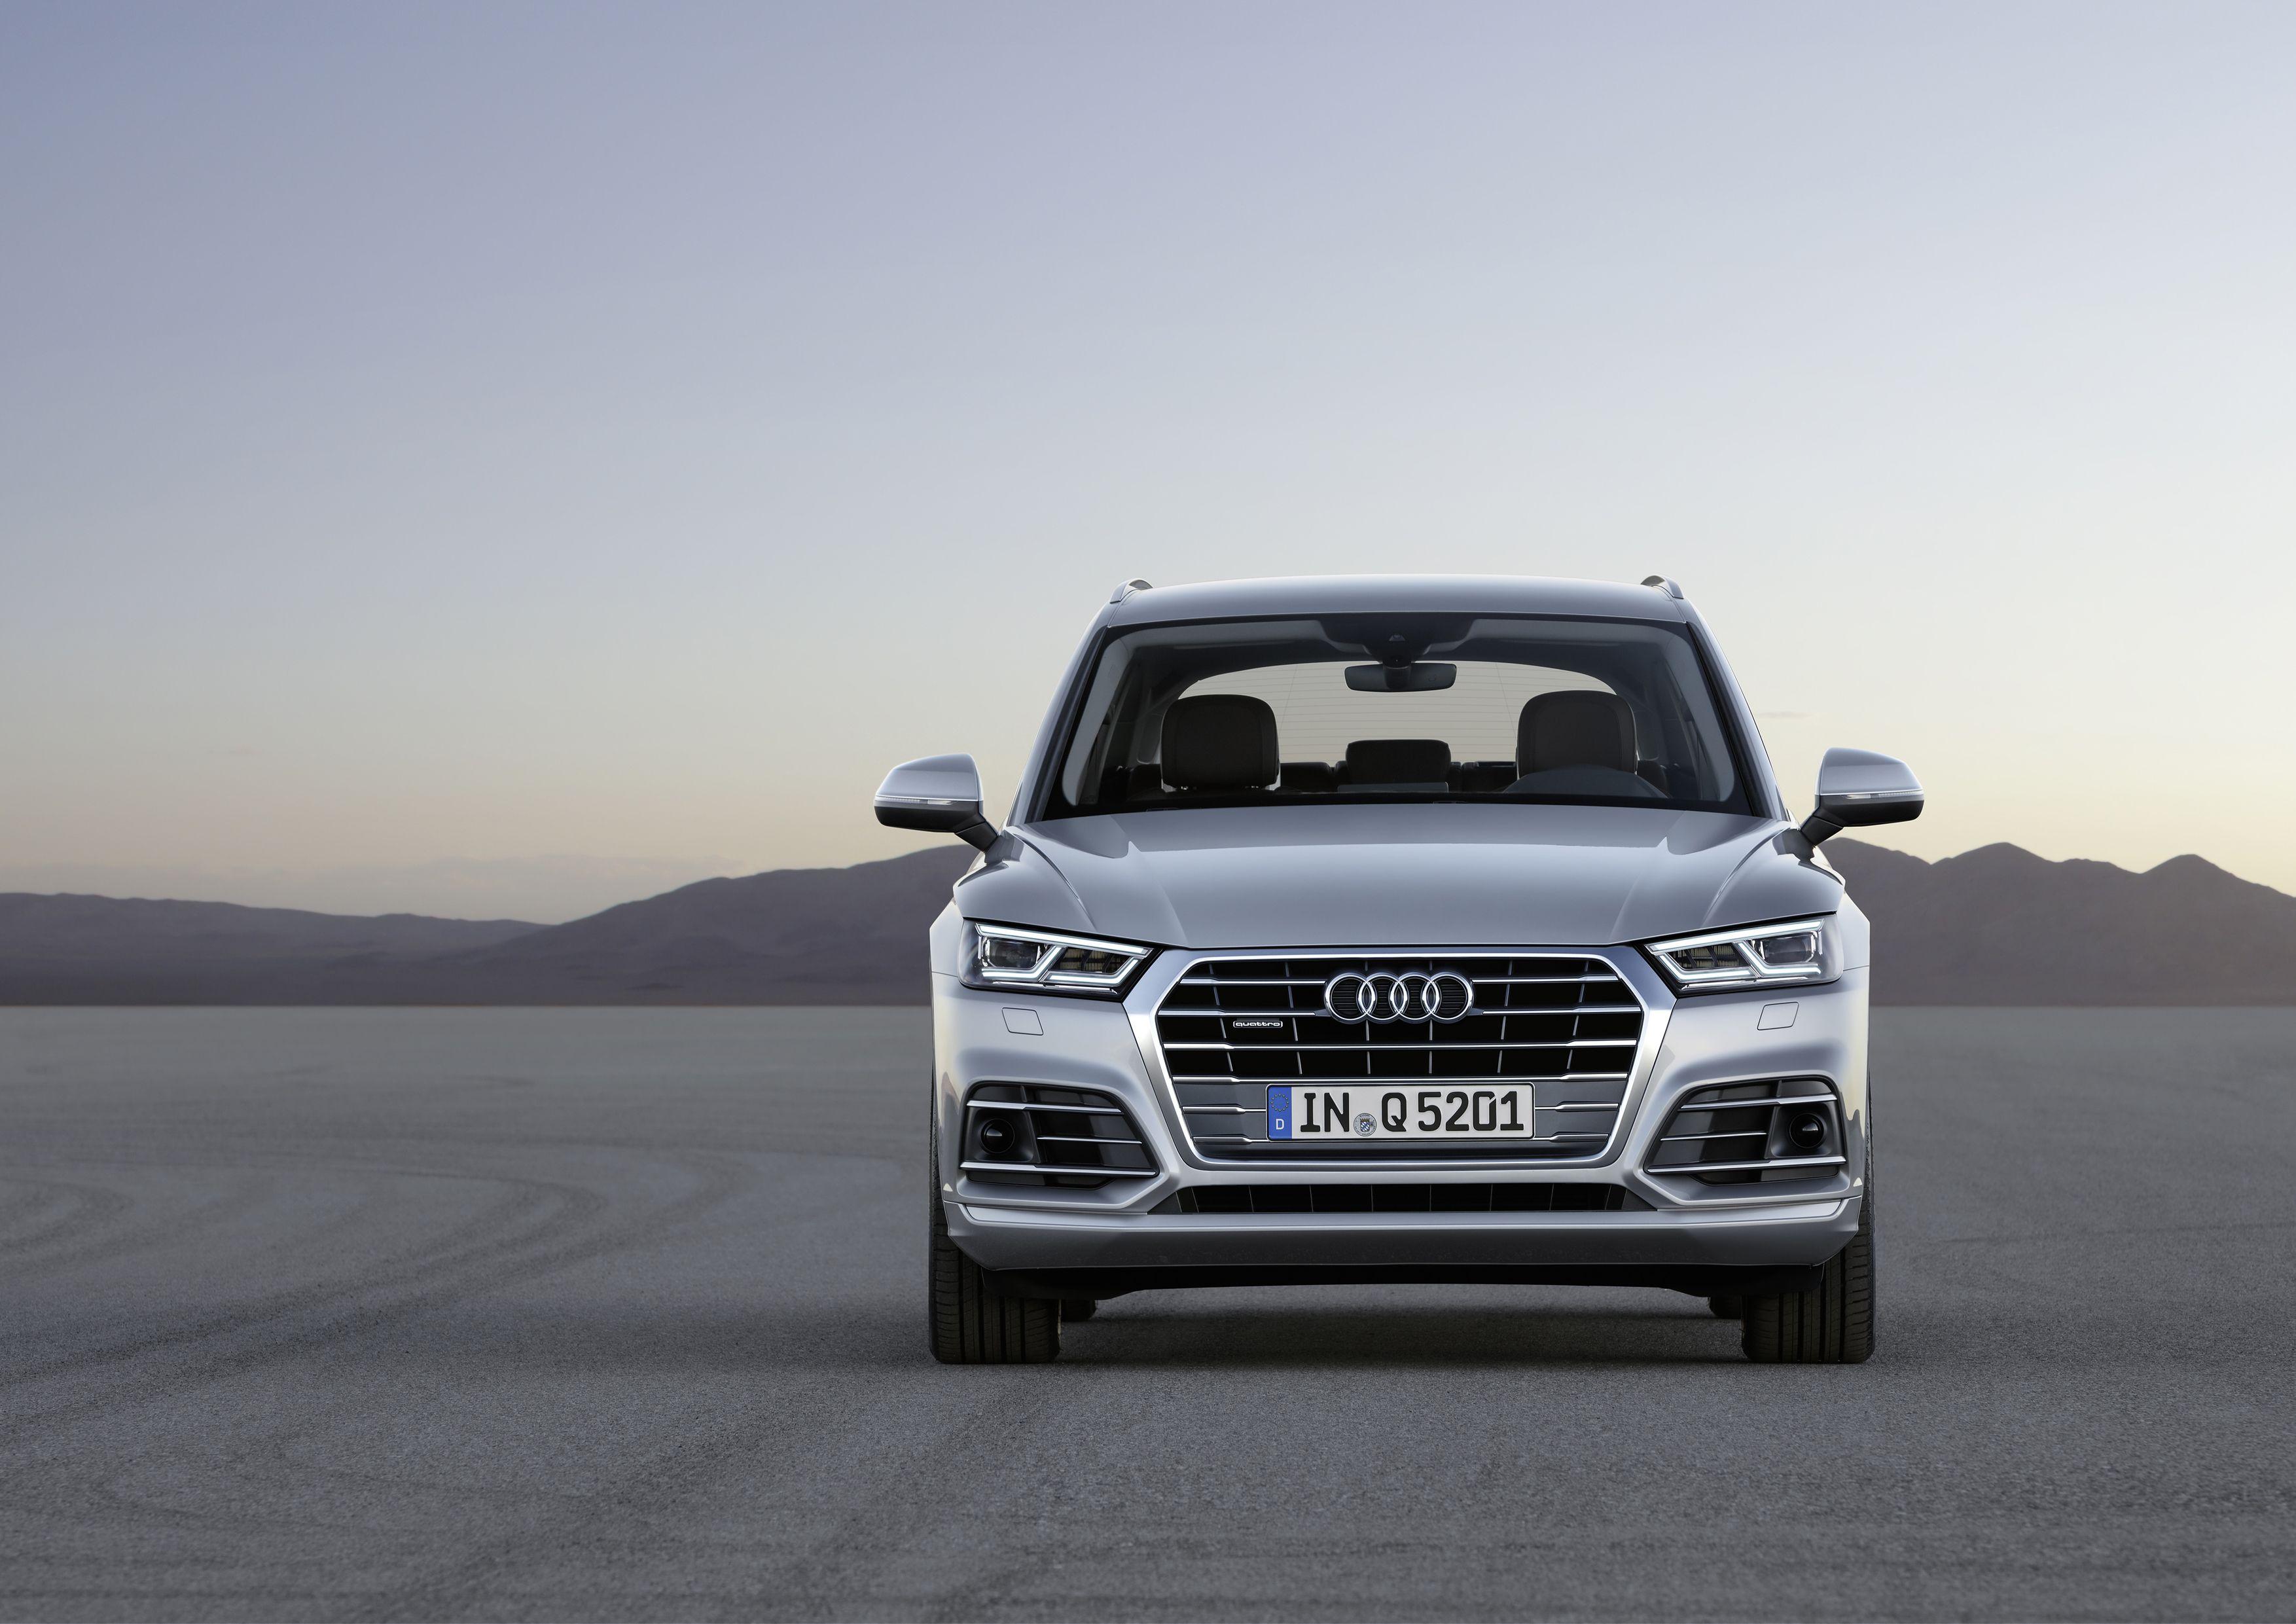 2021 Audi Q5 Facelift Sportback Phev Price In 2020 Audi Q7 Audi New Audi Q7